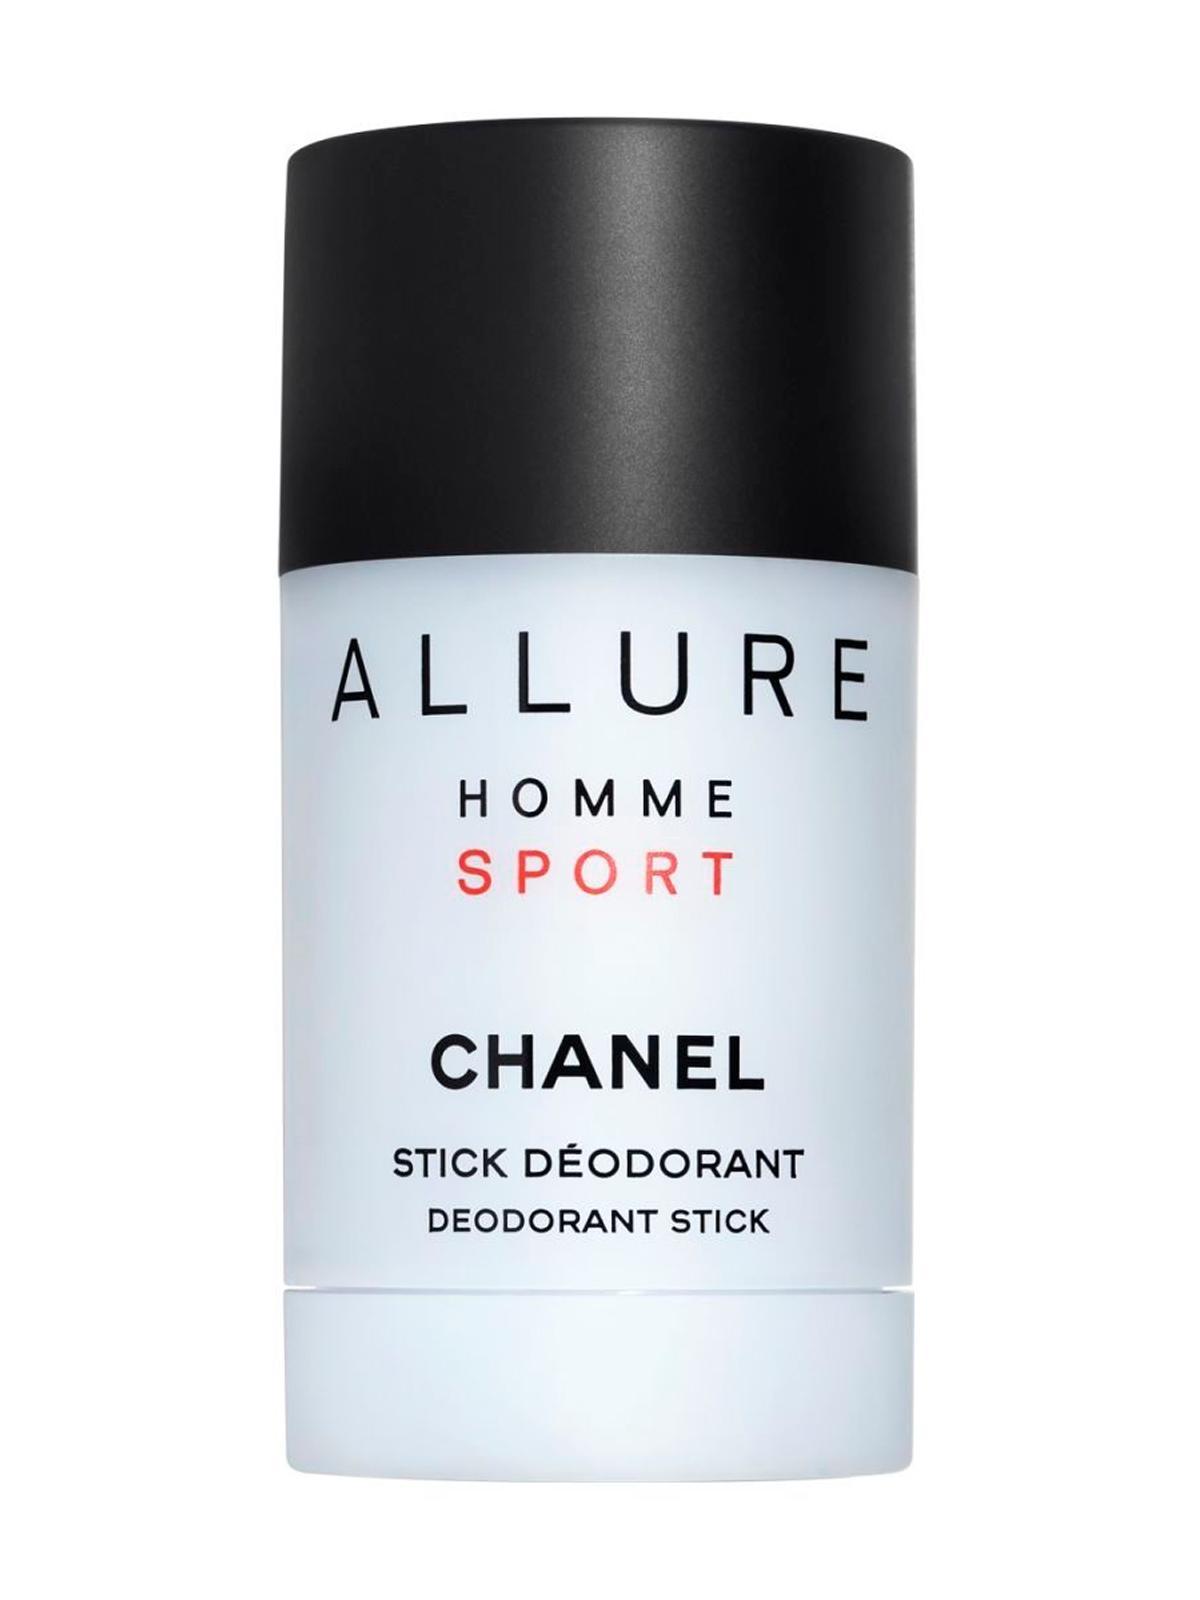 Chanel Allure Sport M Deodrantdrant Stick 75ML